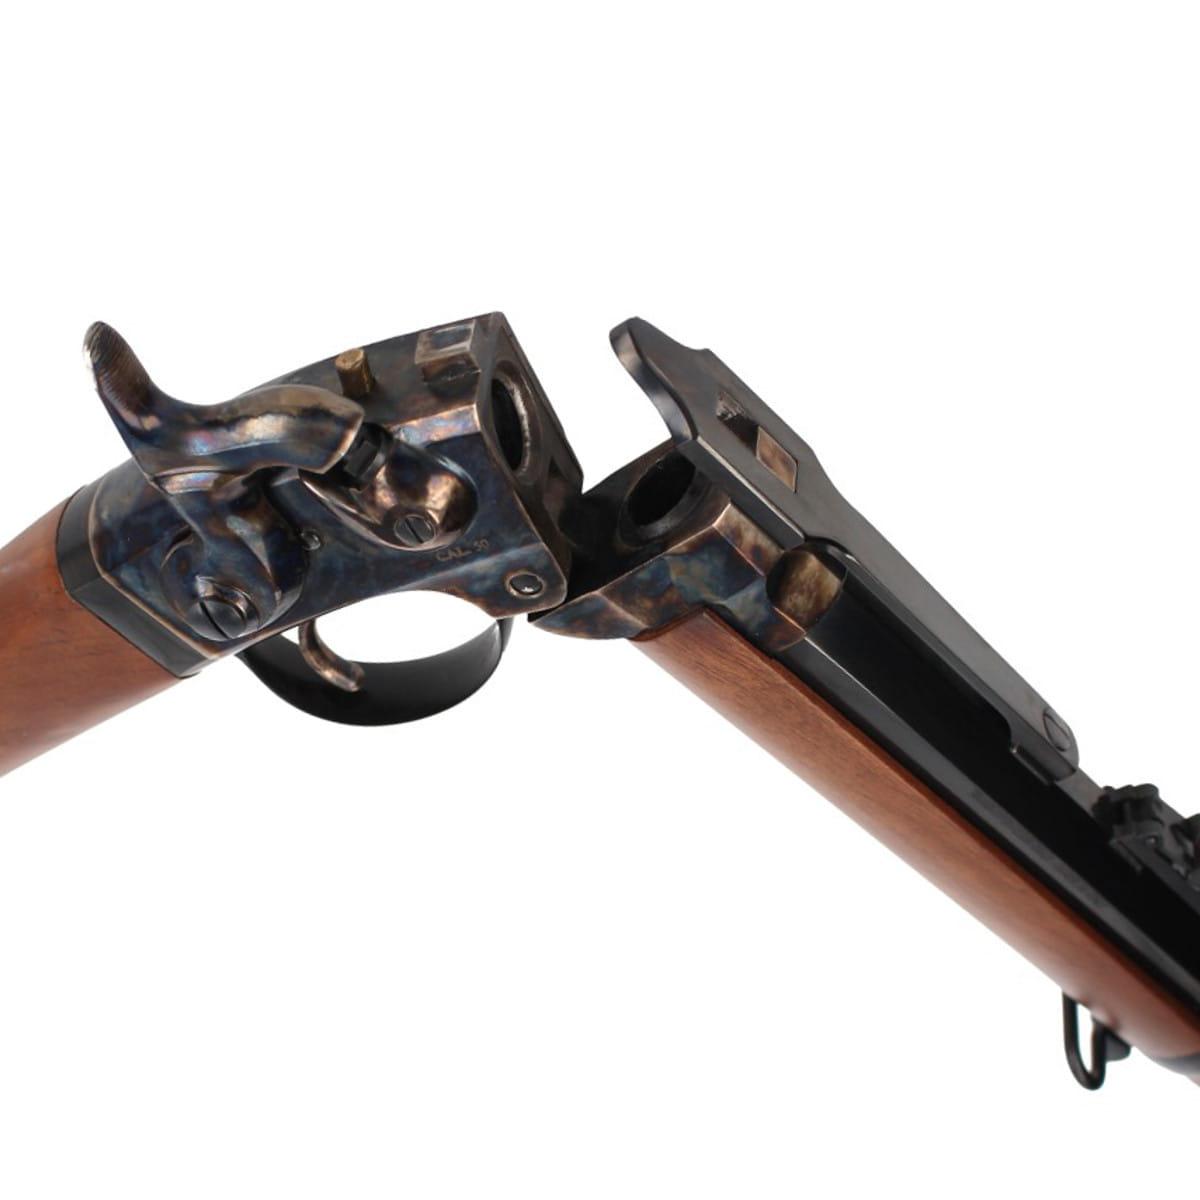 Karabin Pietta Smith Carbine Artillery kal 50 (SMT50)